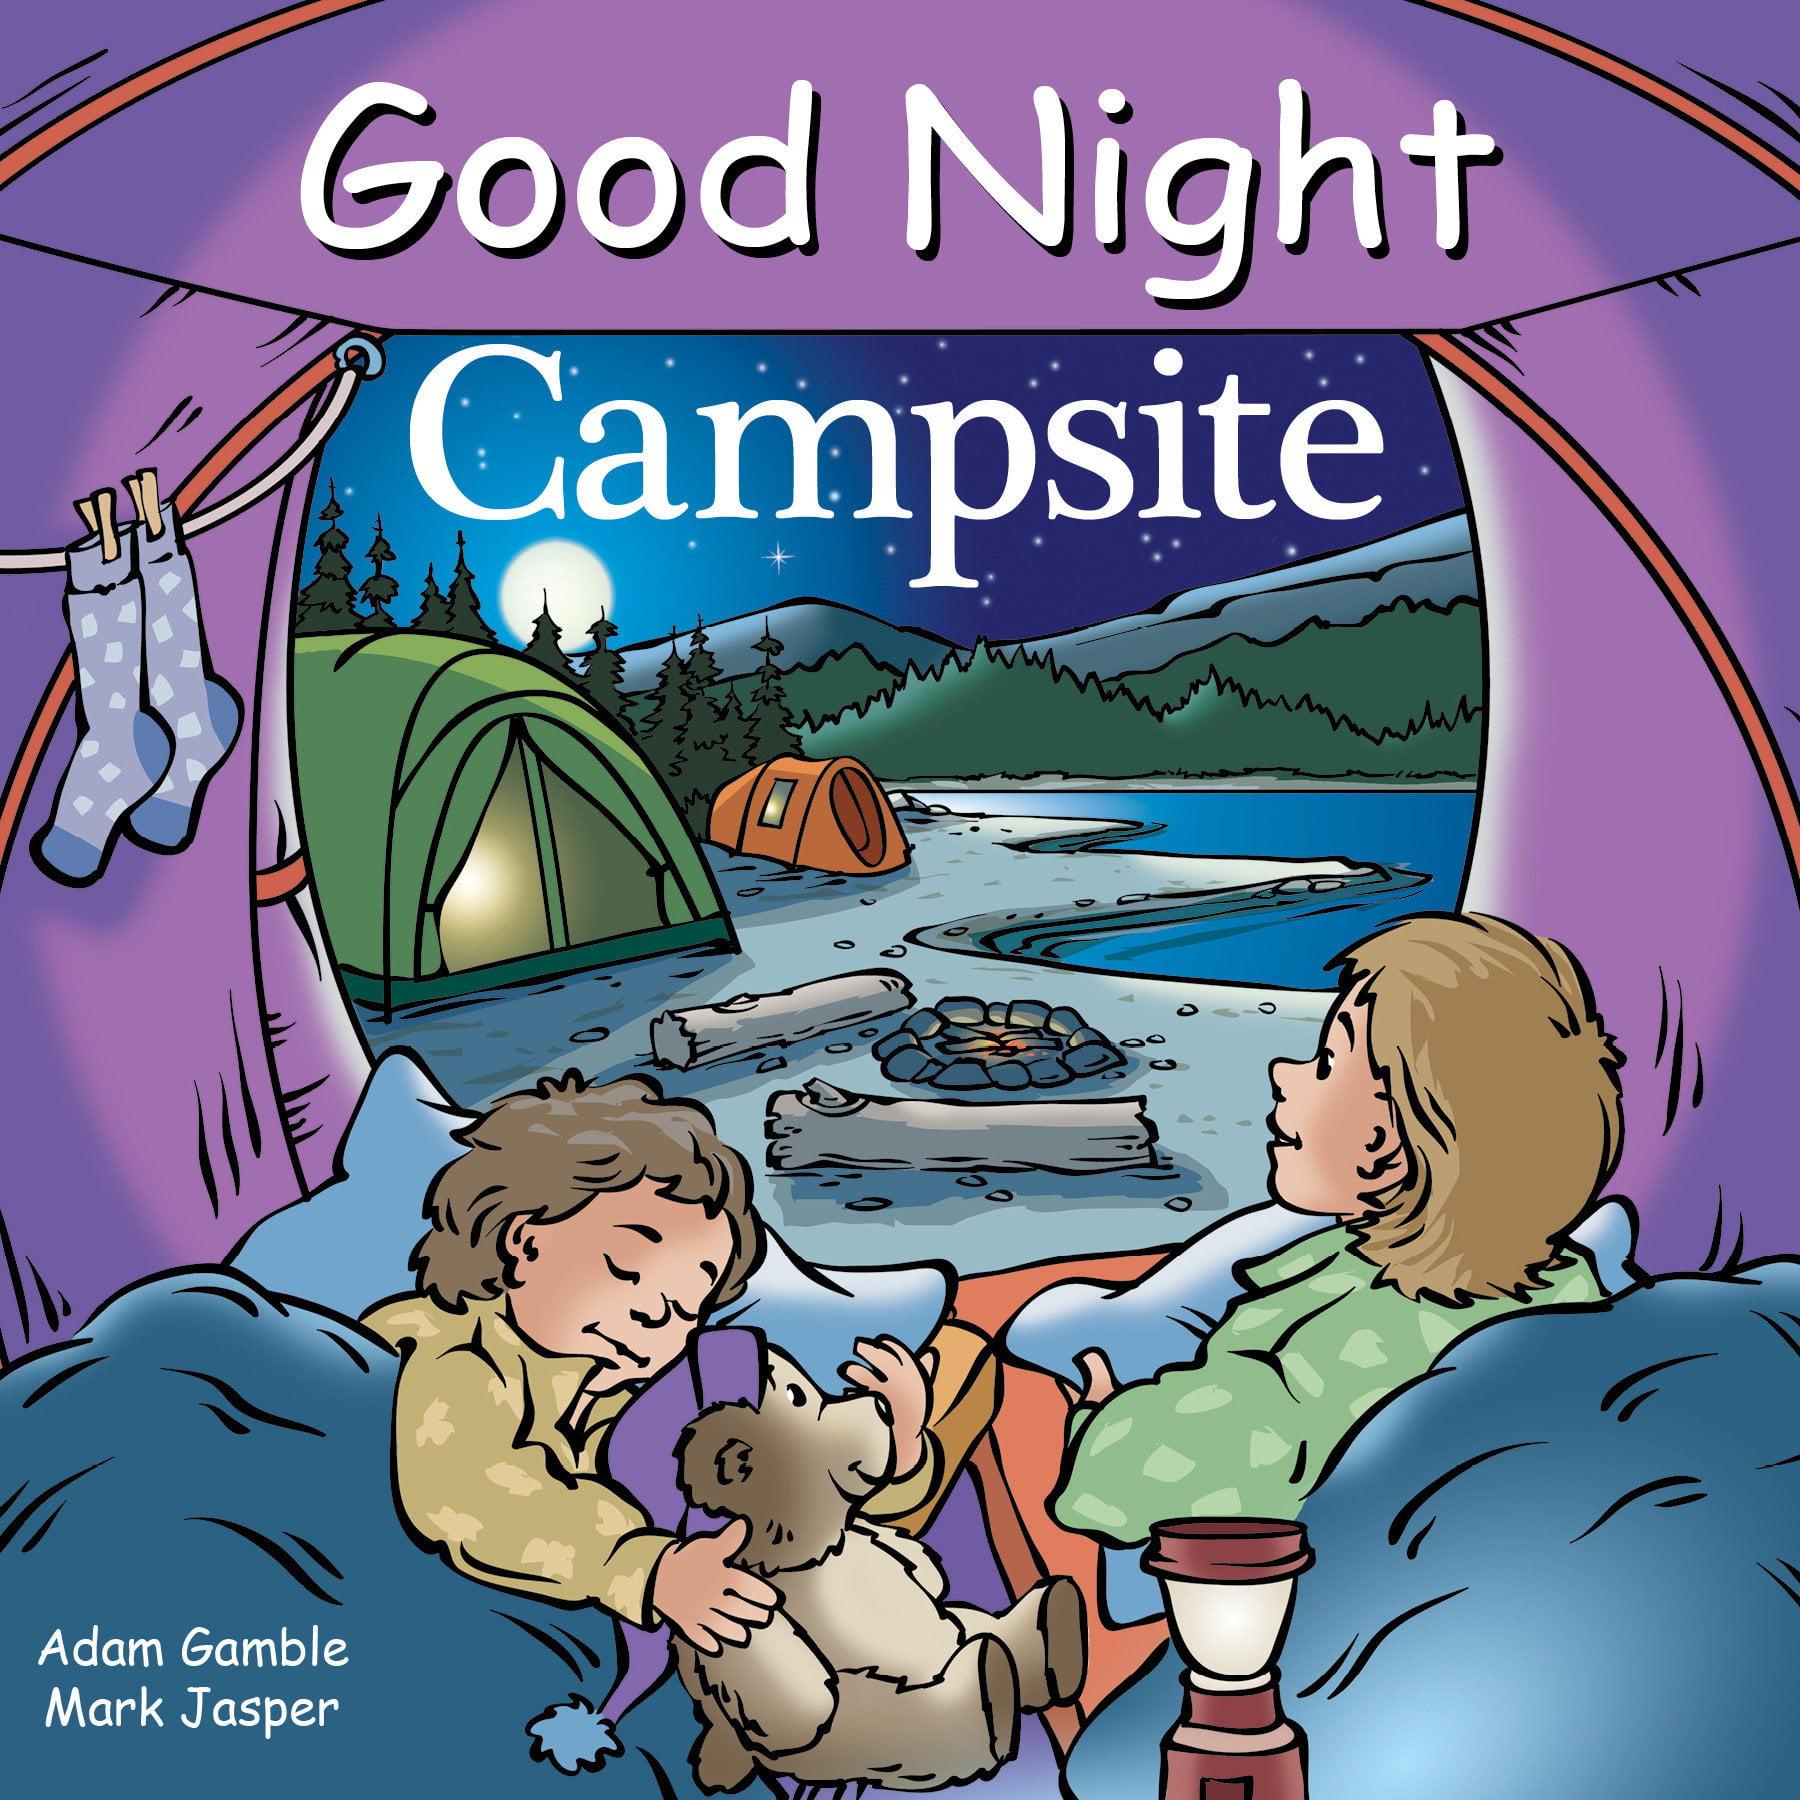 Good Night Campsite (Board Book) - Walmart.com - Walmart.com